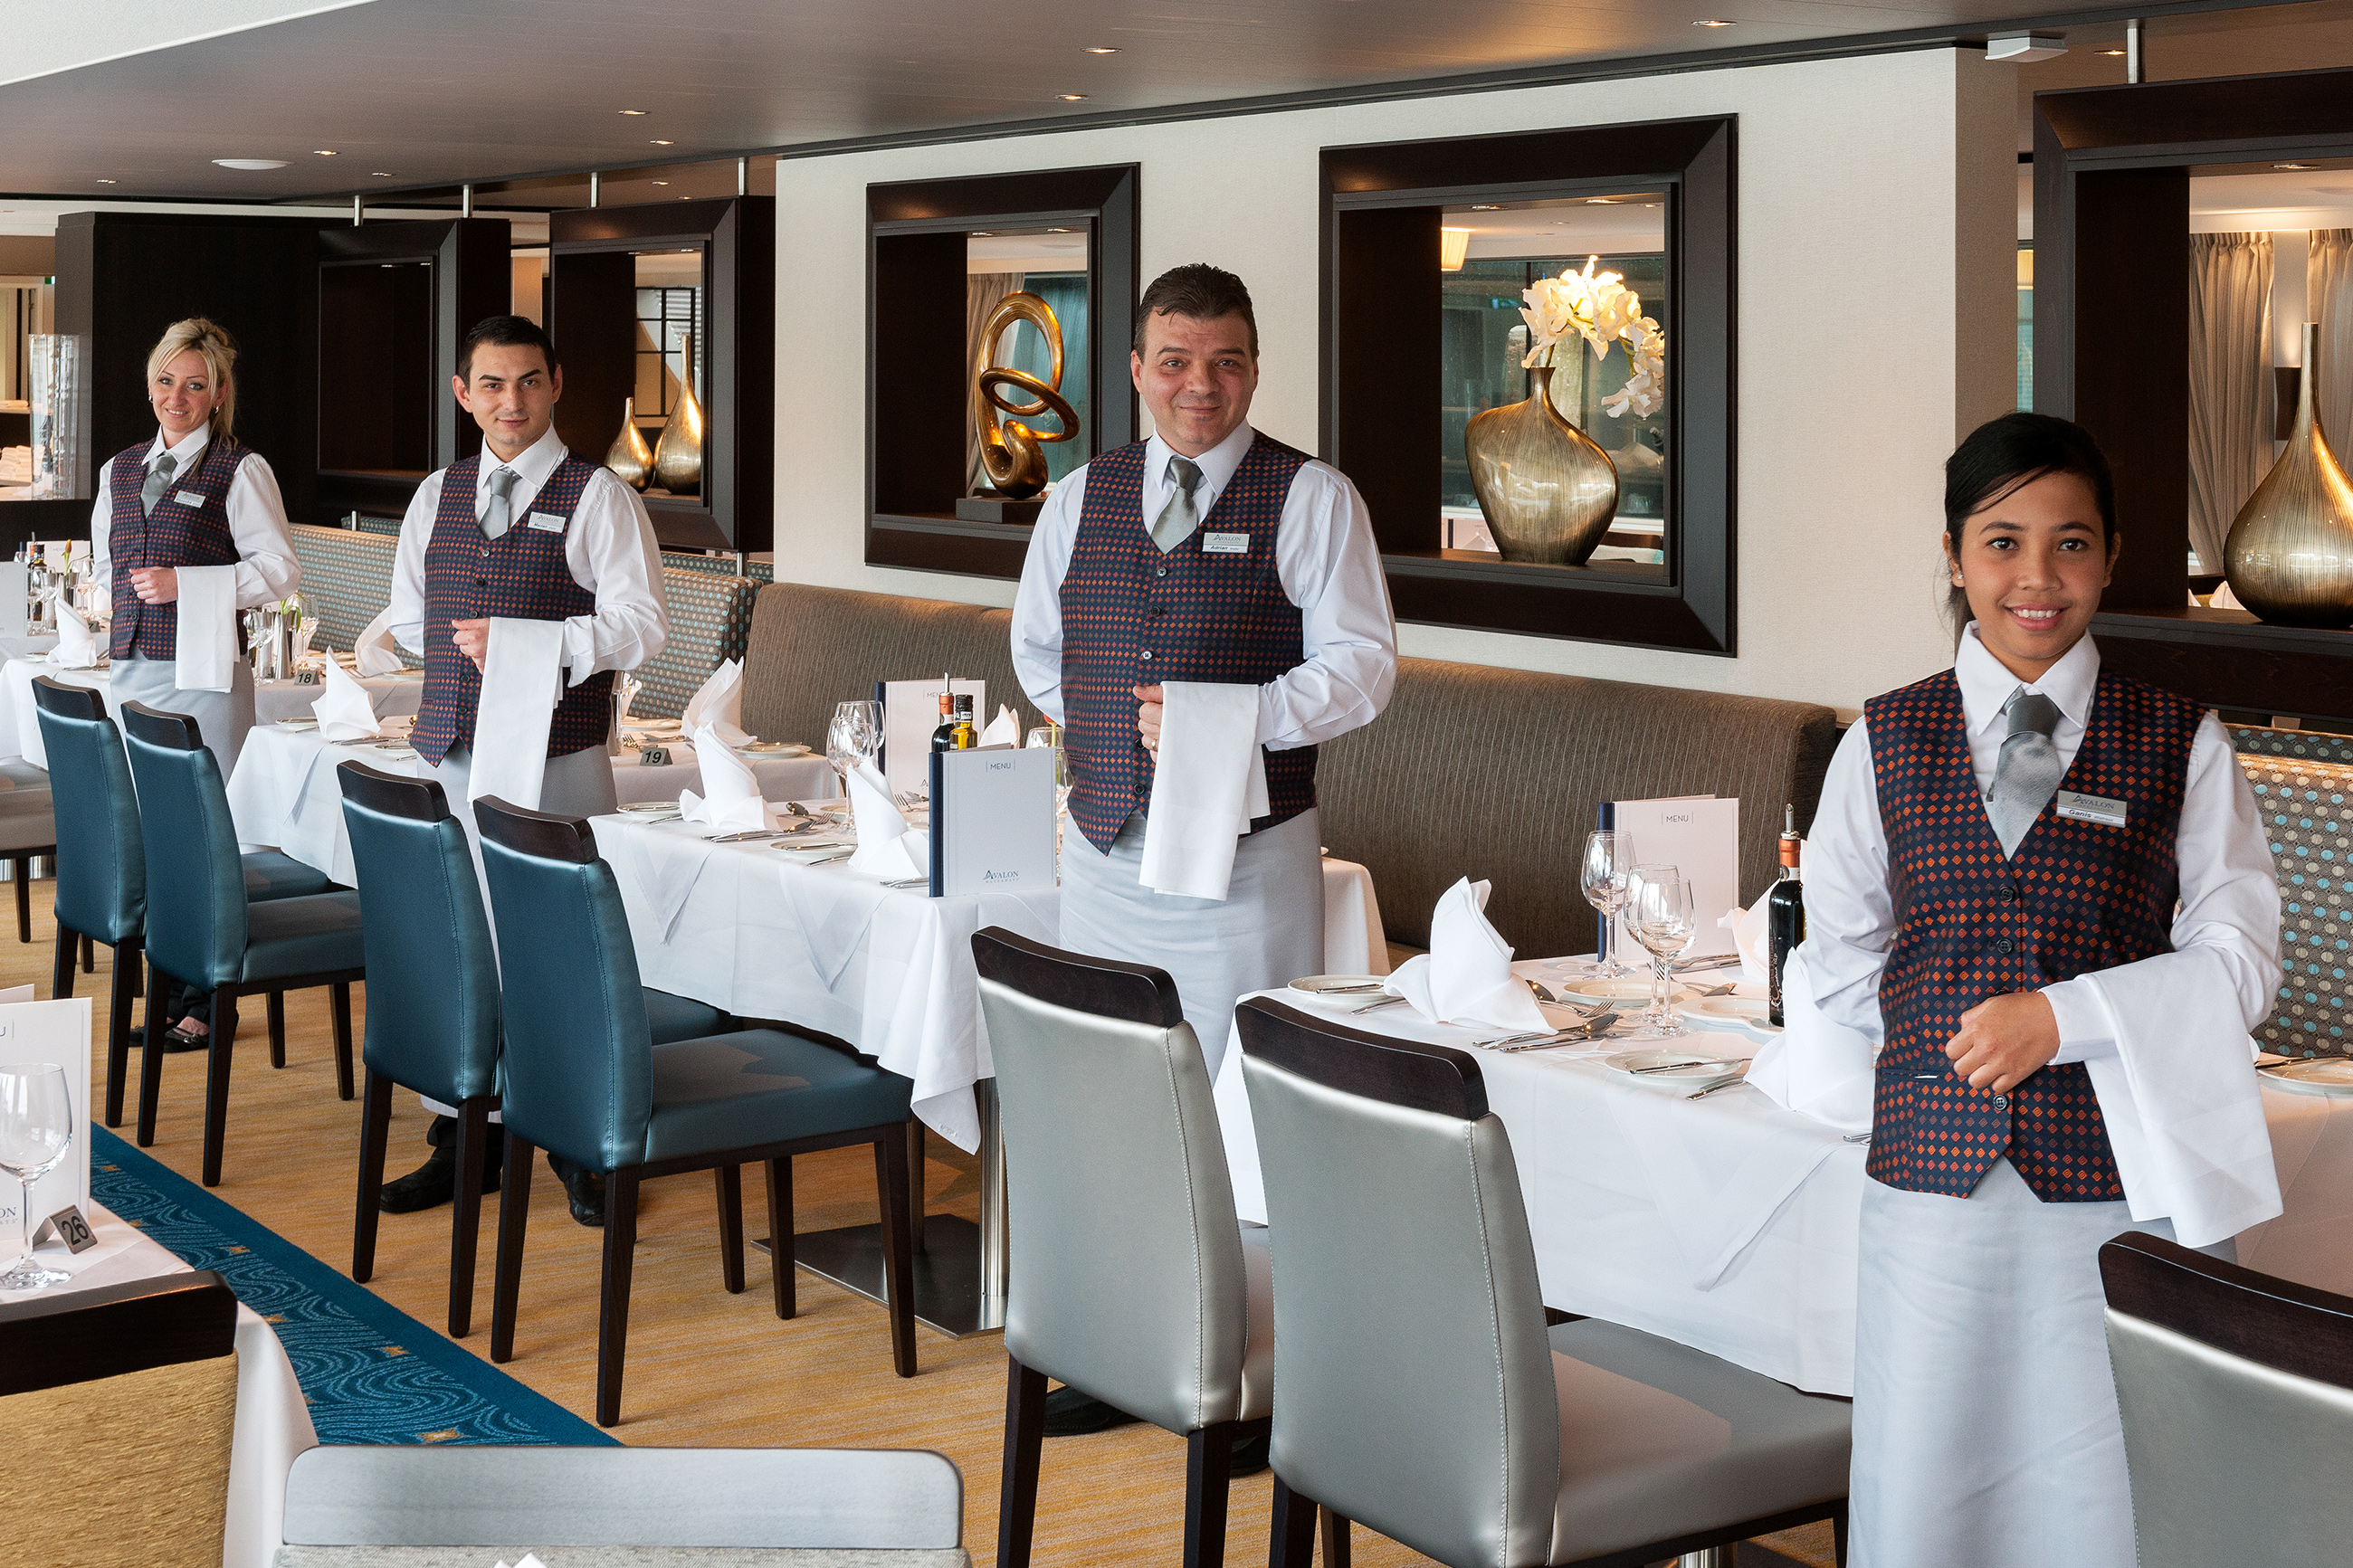 dining-staff.jpg